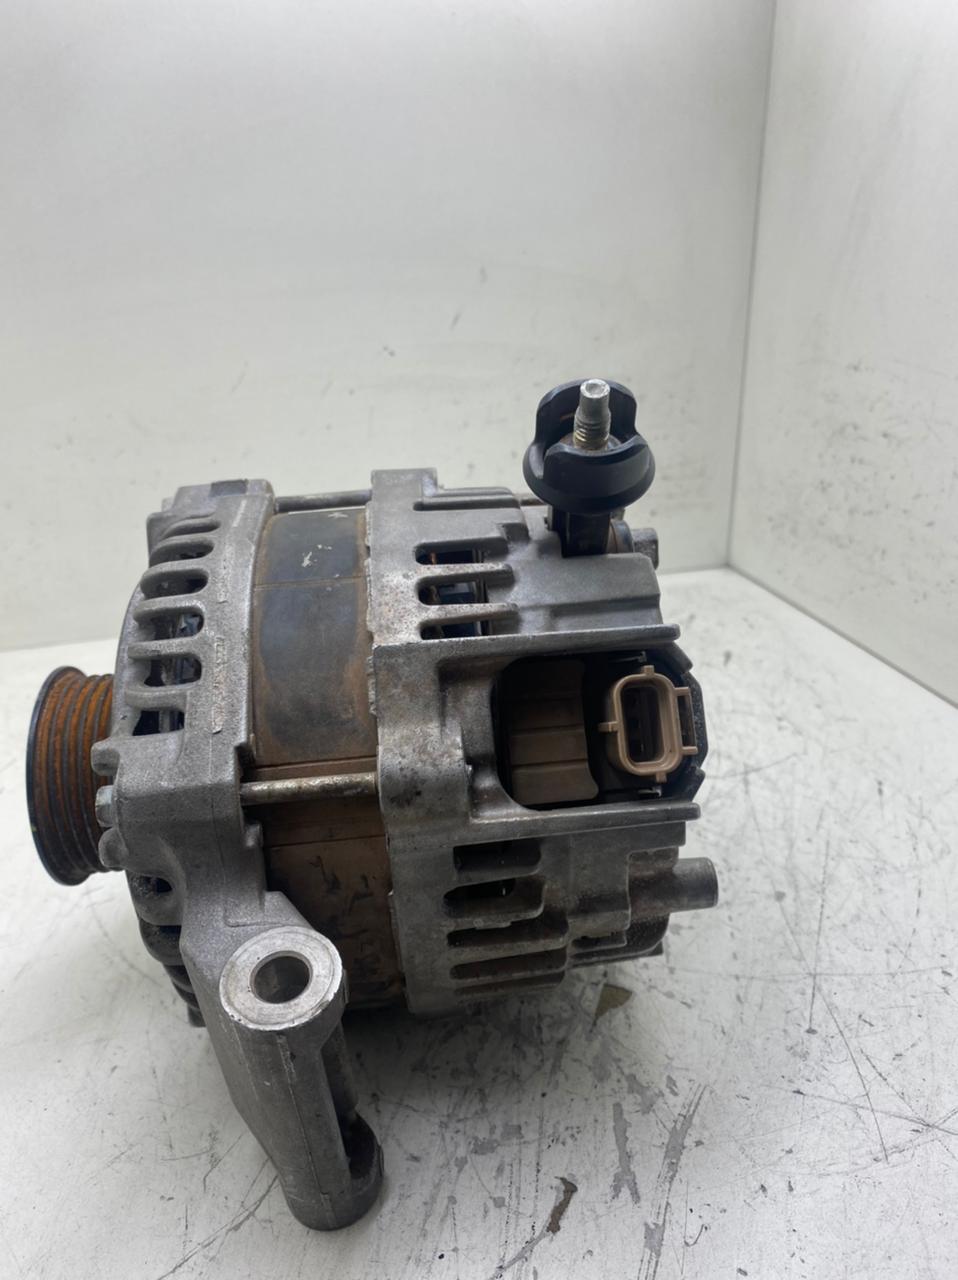 Alternador Ford Fusion Ecosport 2.0 150AMP A002TX0191ZC 8S4T10300AC 4909BM574E A002TX0391 A002TX0391ZC 8A4T10300AC 8A4Z10346A